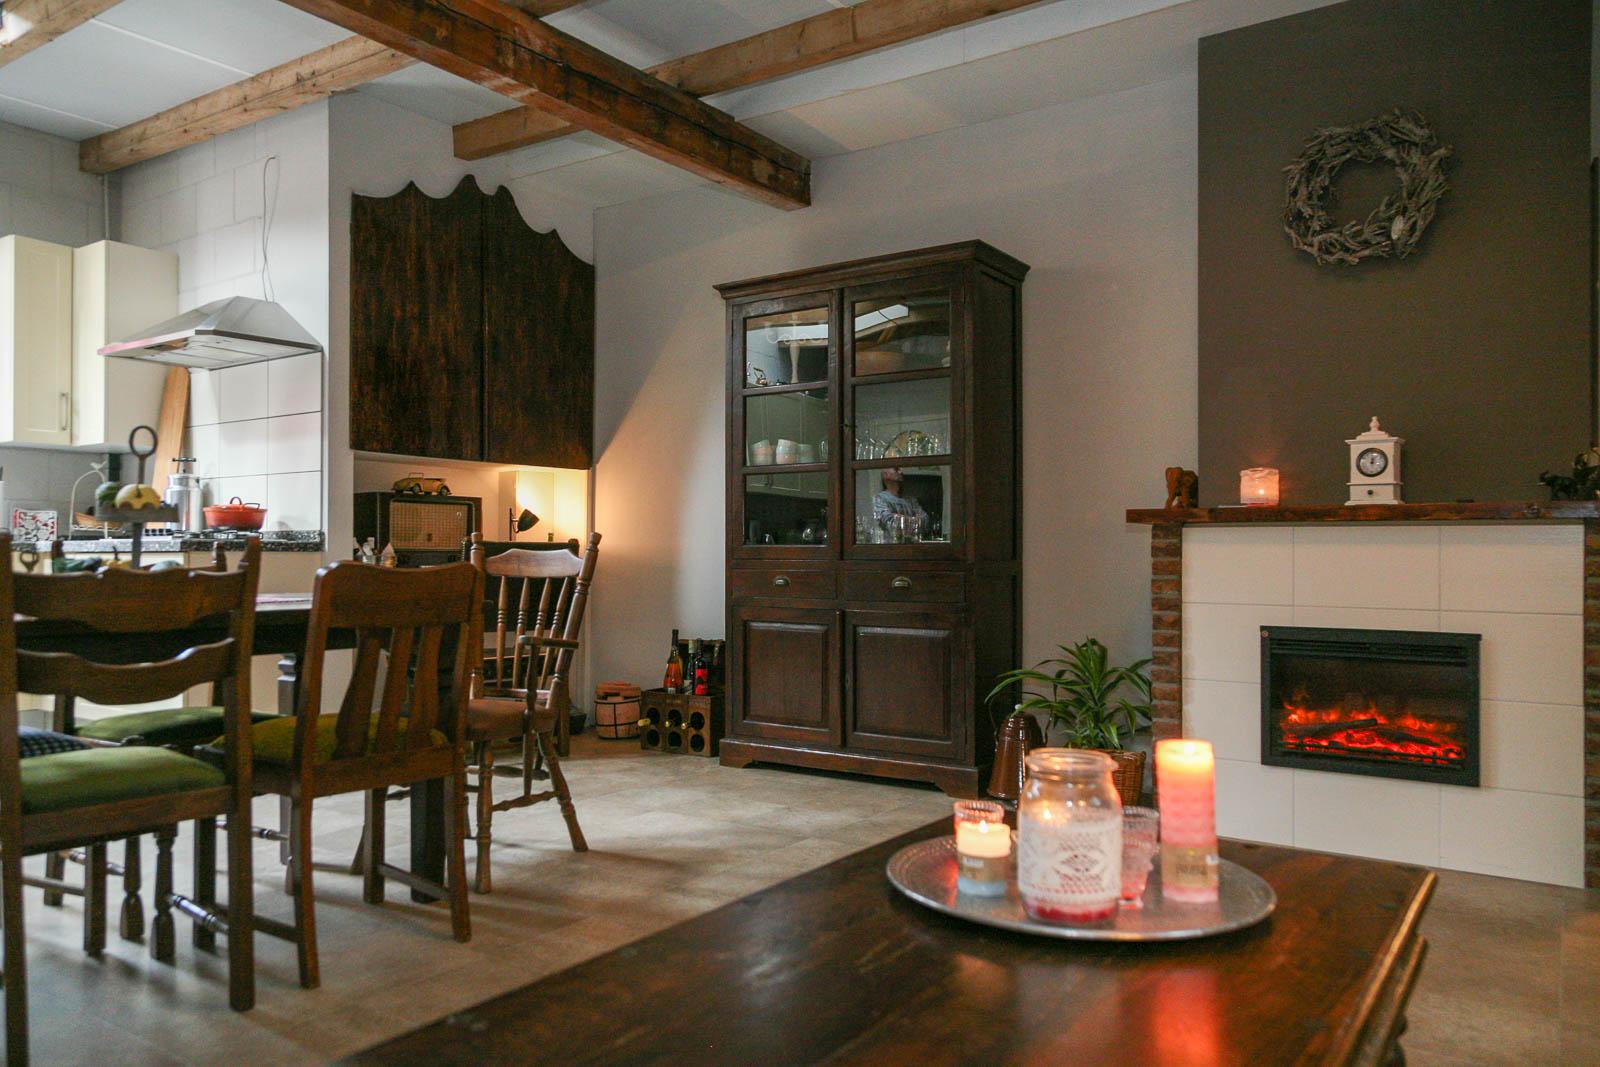 Hillegondahoeve-De Oude Stal-1427